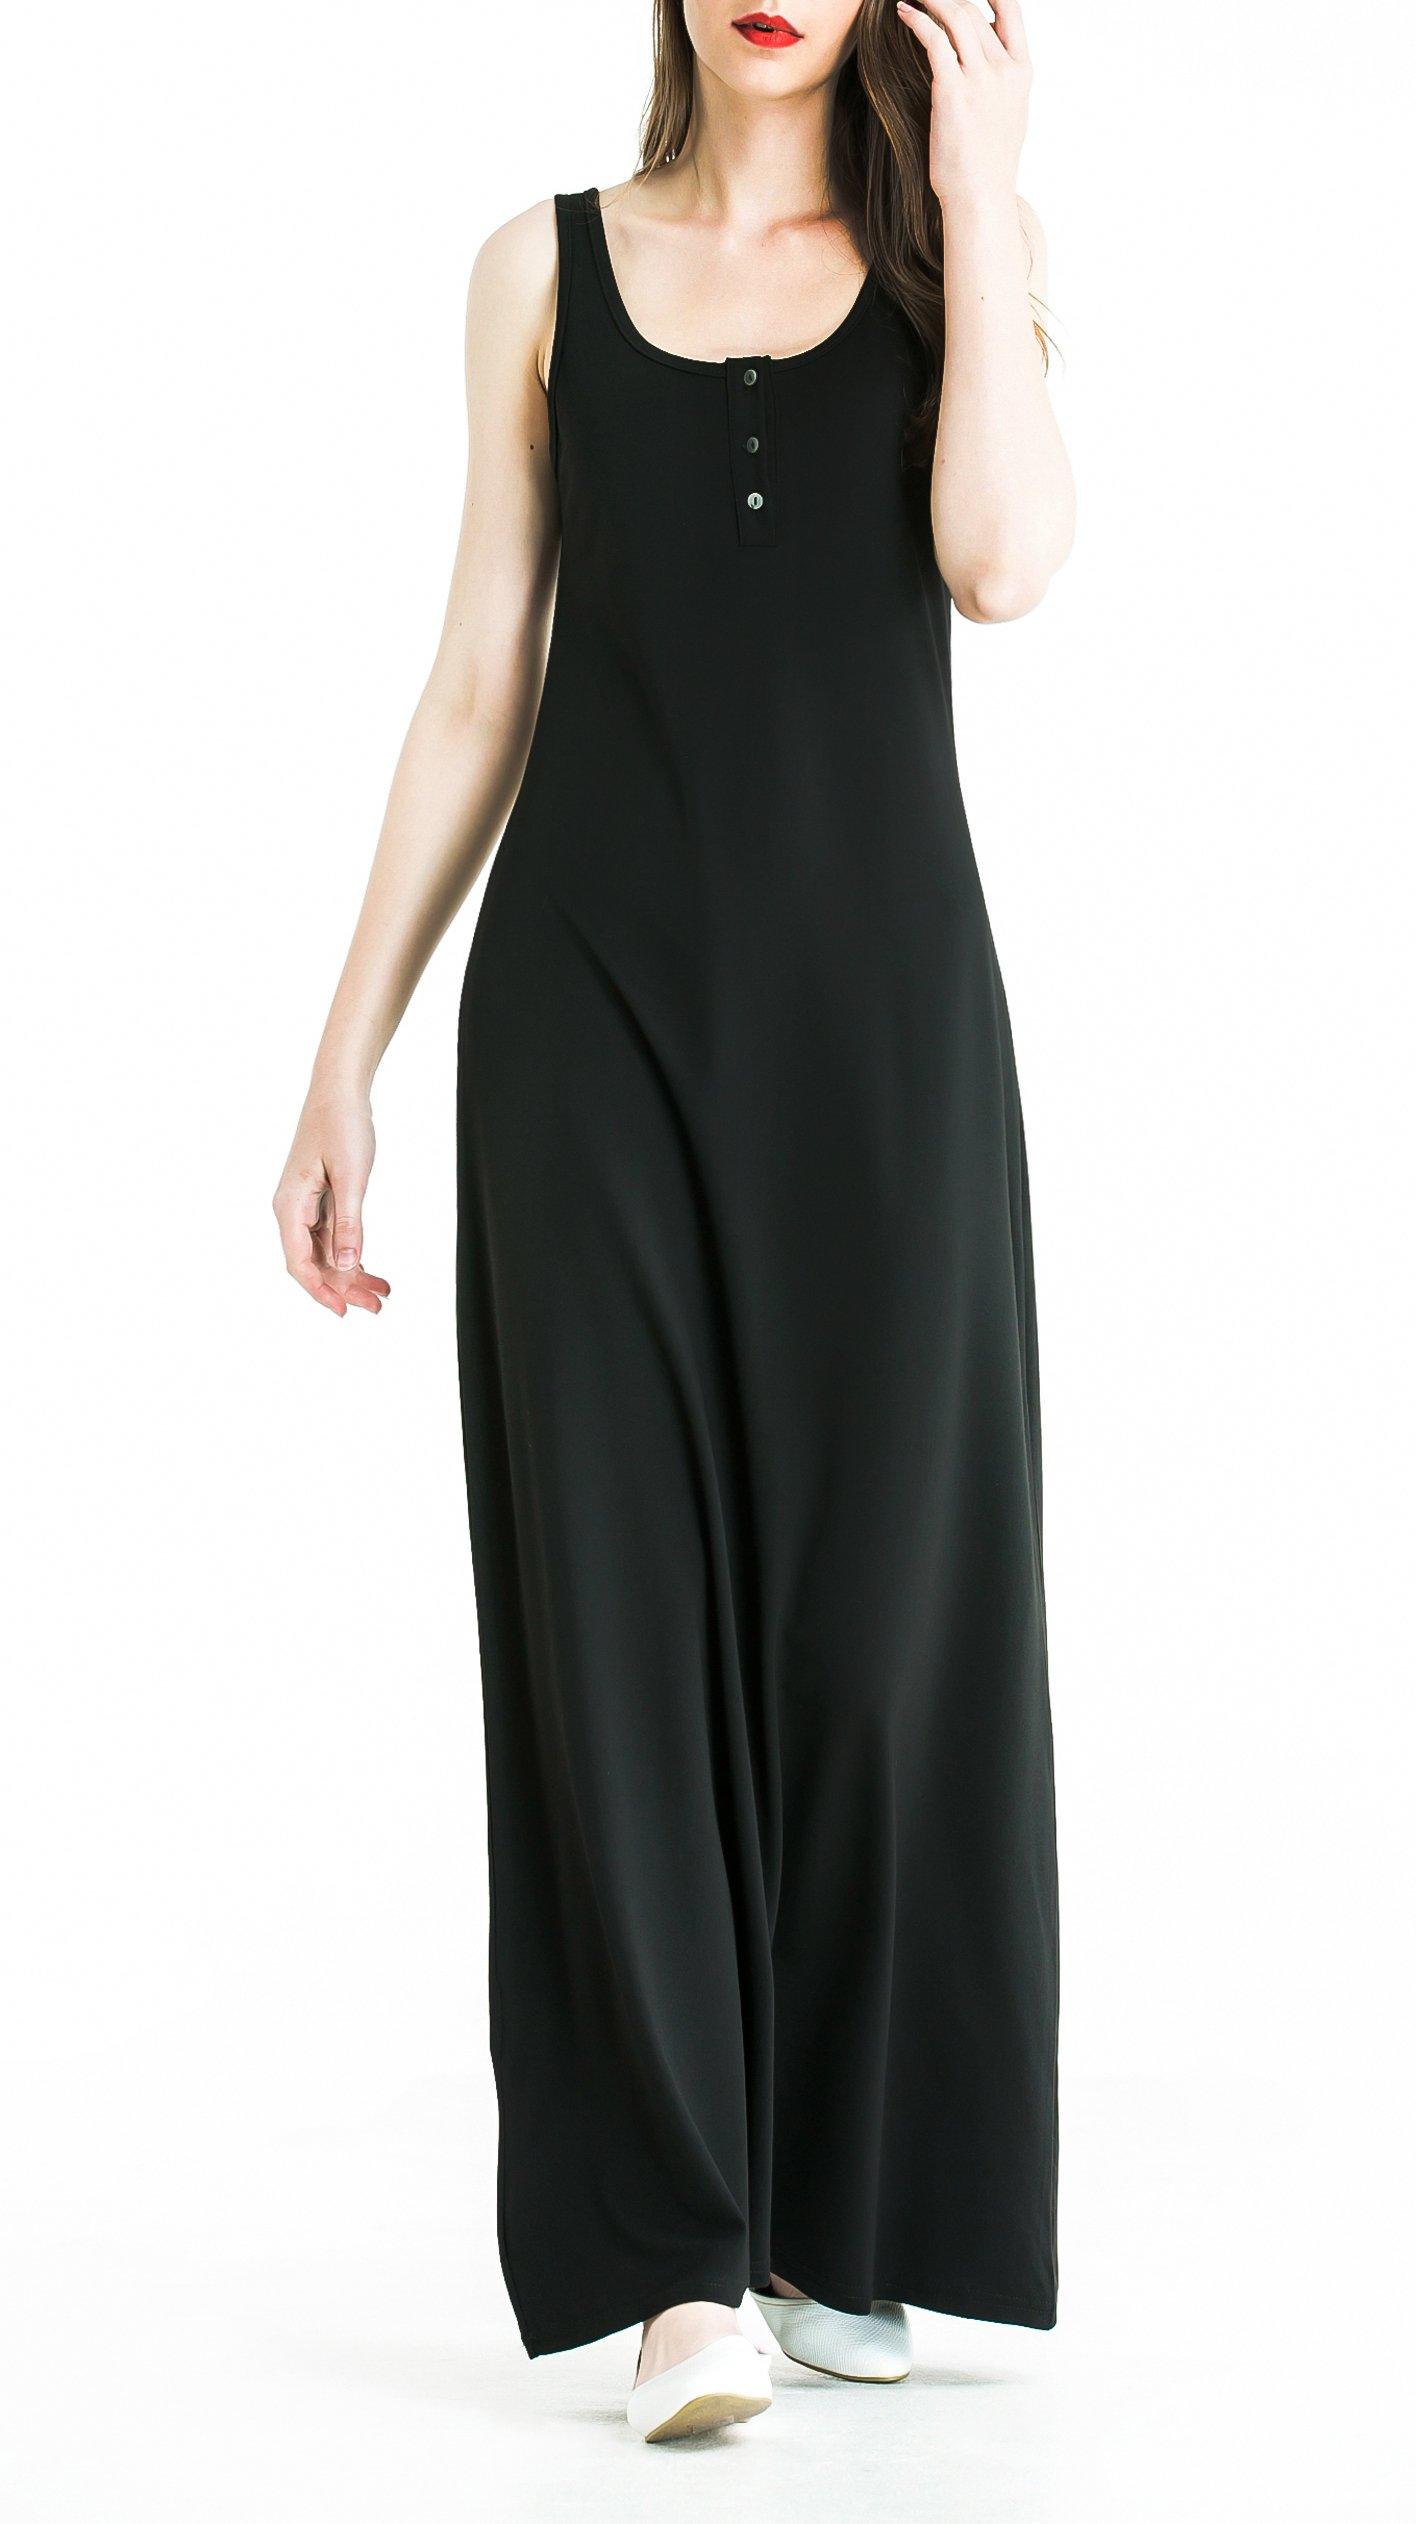 Zredurn Women's O-Neck Casual Home Beach Maxi Long Dress (Black, L)